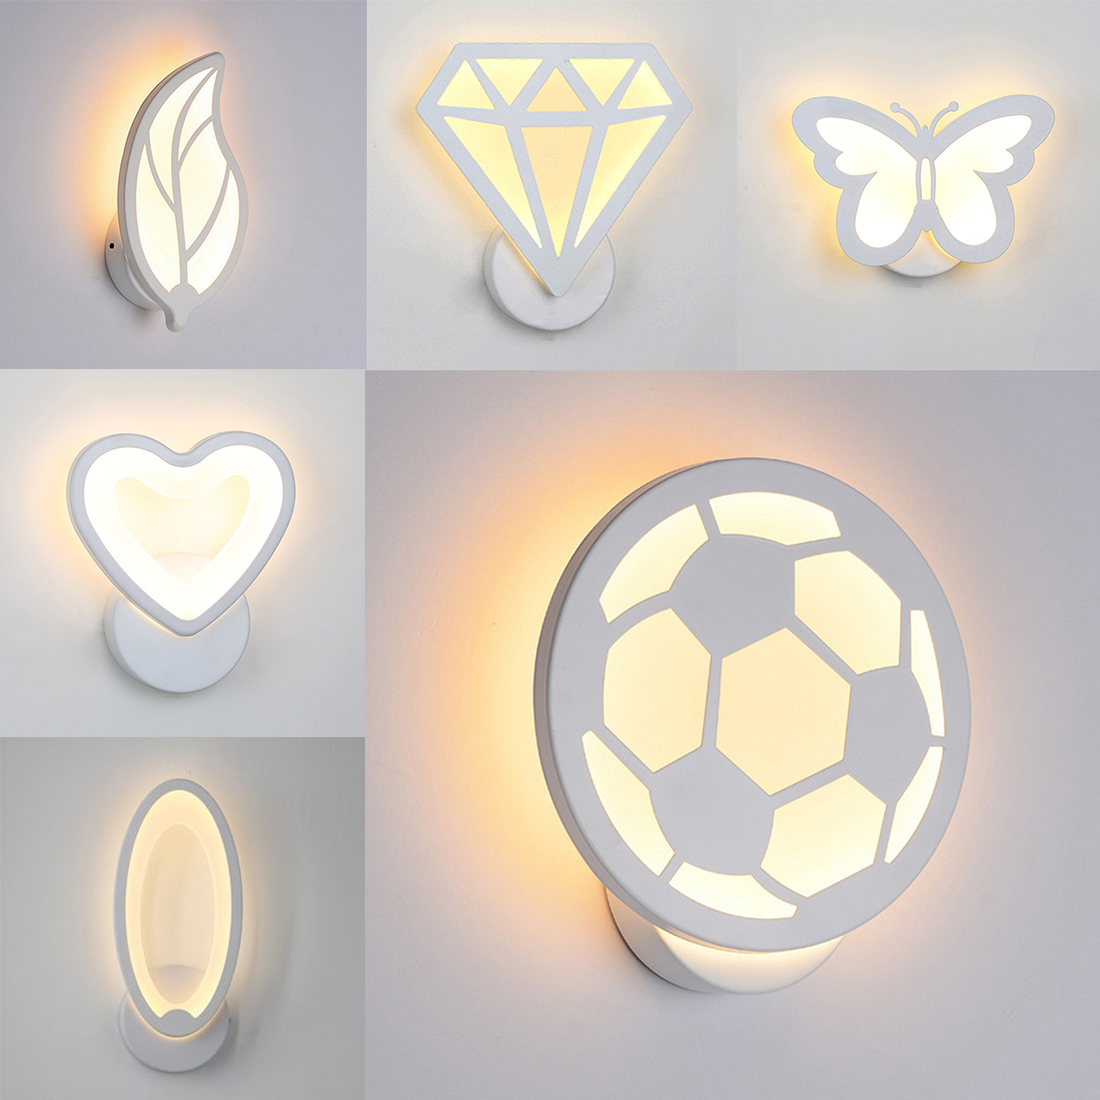 Led Lamps Creative Led Wall Lamp 1pc 12w Led Acrylic Wall Light Led Wall Lamp Bedside Room Bedroom Wall Lamps Arts Postmodern Minimalist